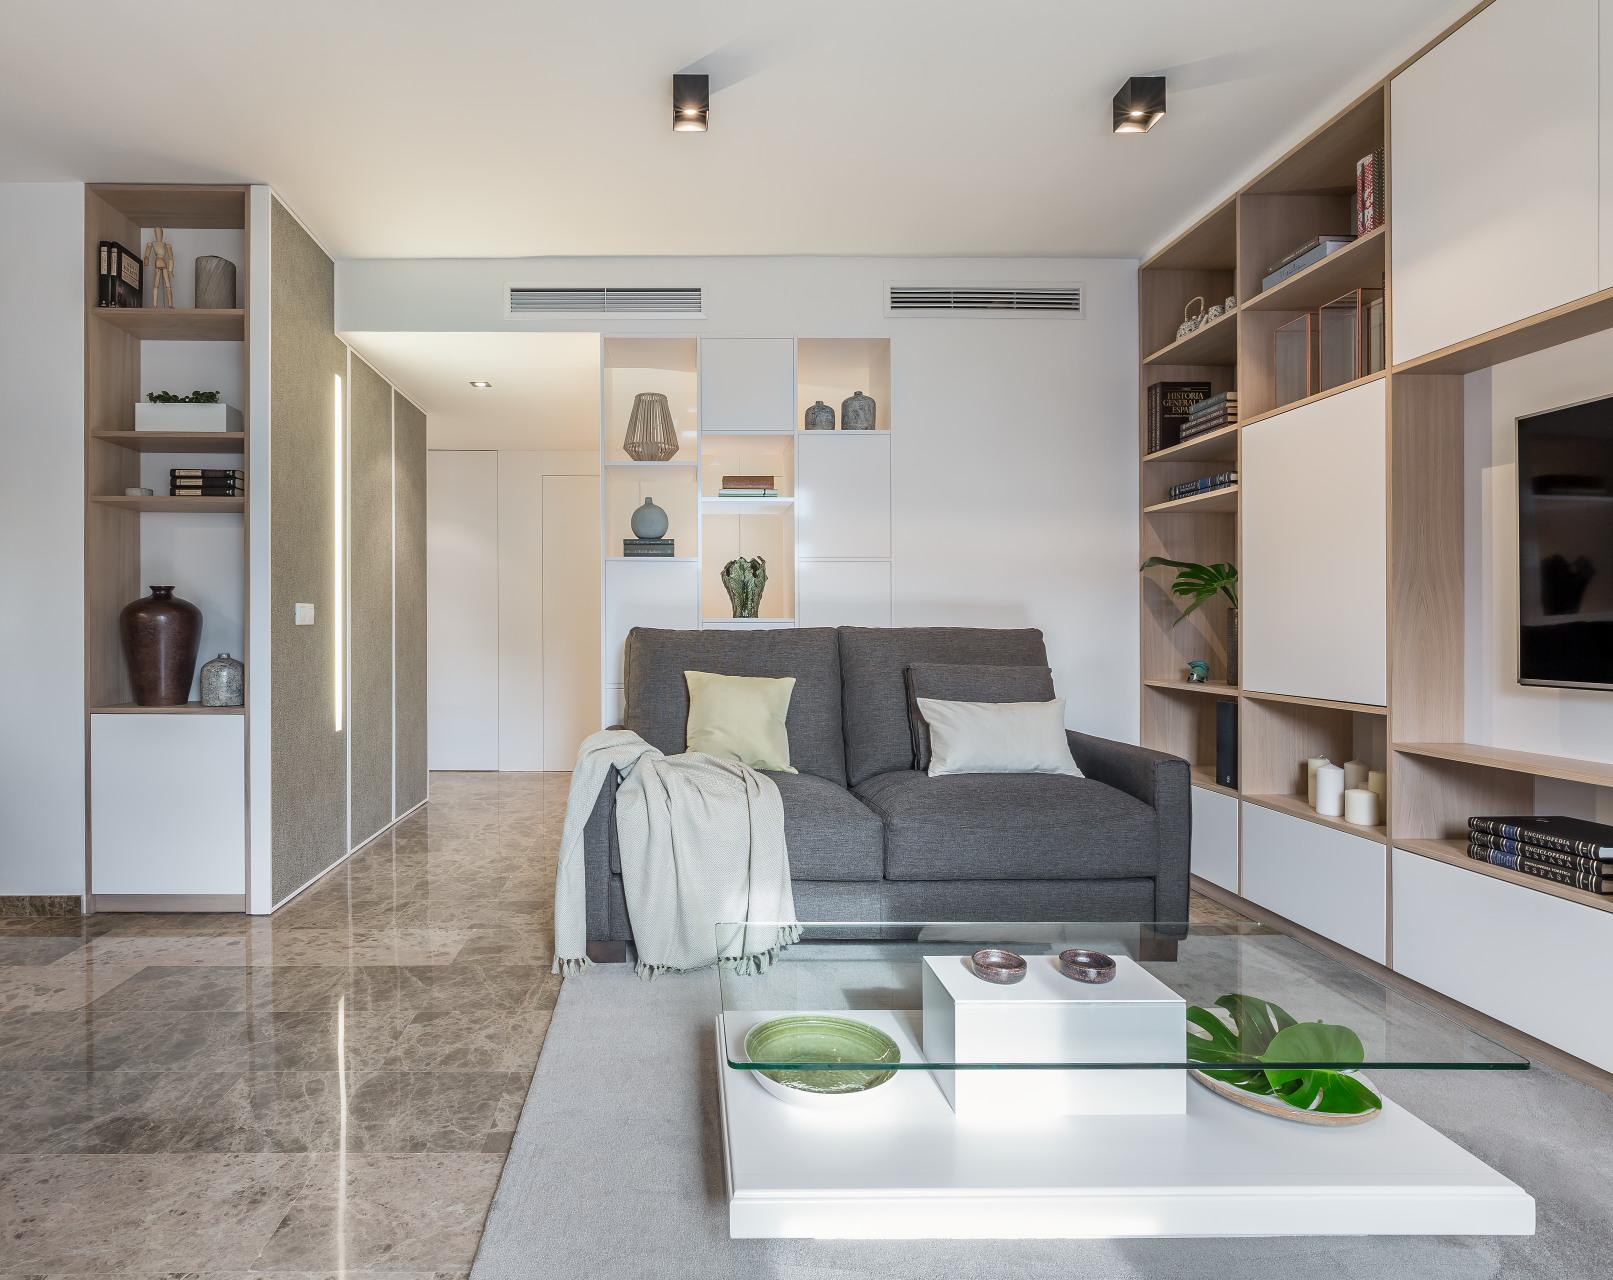 fotografia-arquitectura-interiorismo-valencia-german-cabo-laura-yerpes-mandas (9)